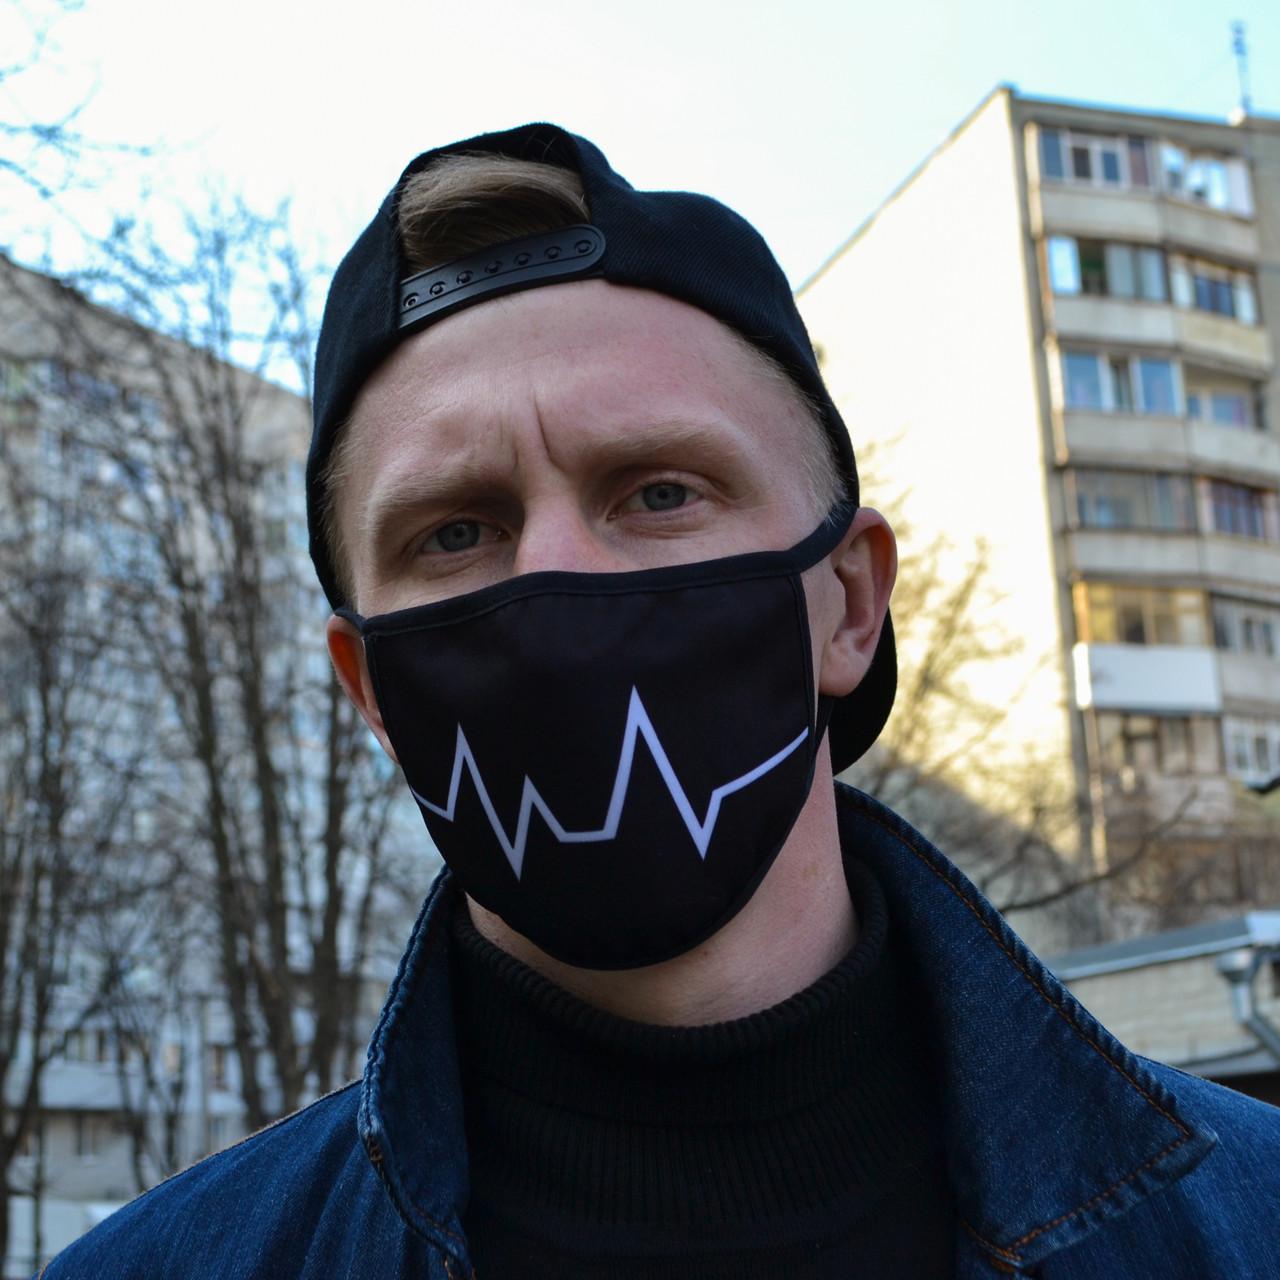 "Маска унисекс черная маска для лица ""Кардиограмма"" многоразовая тканевая"